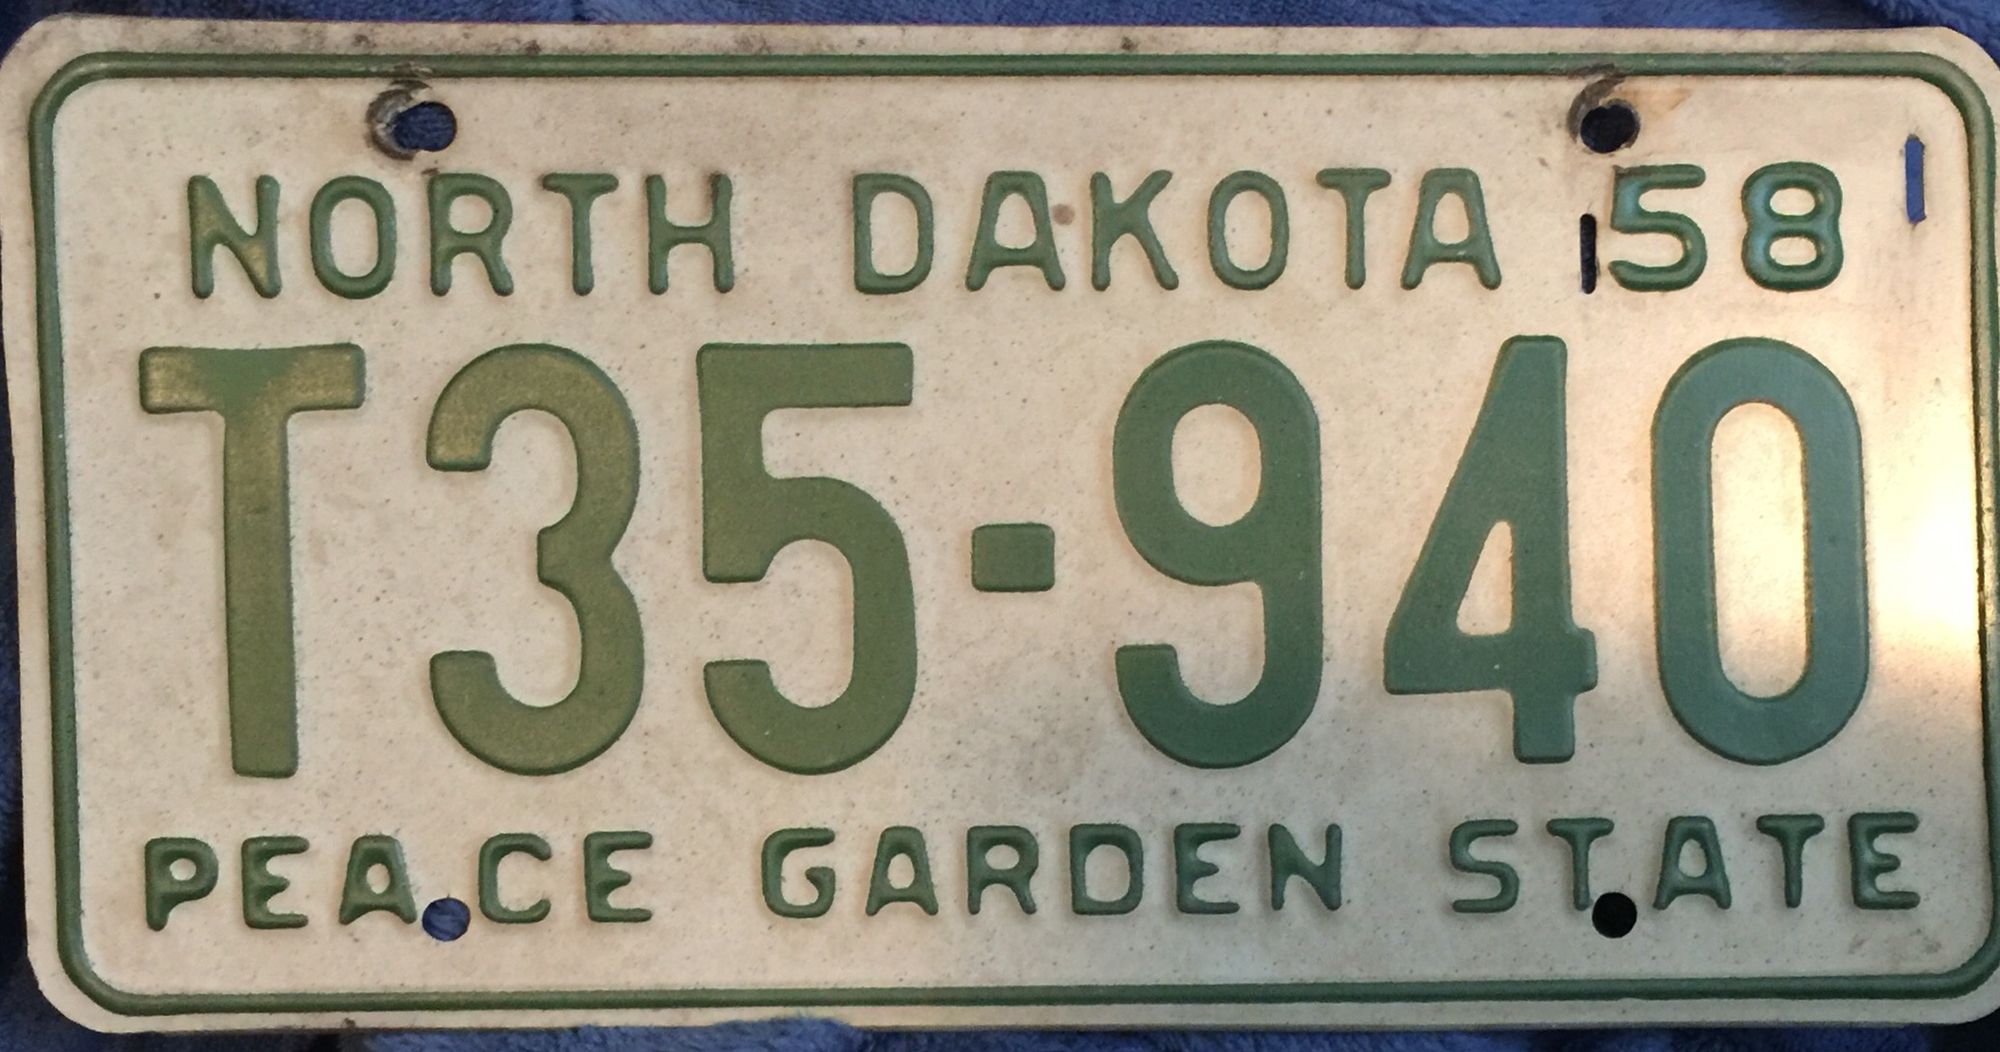 1990 Illinois Farm License Plates   ojo   Pinterest   License plates ...